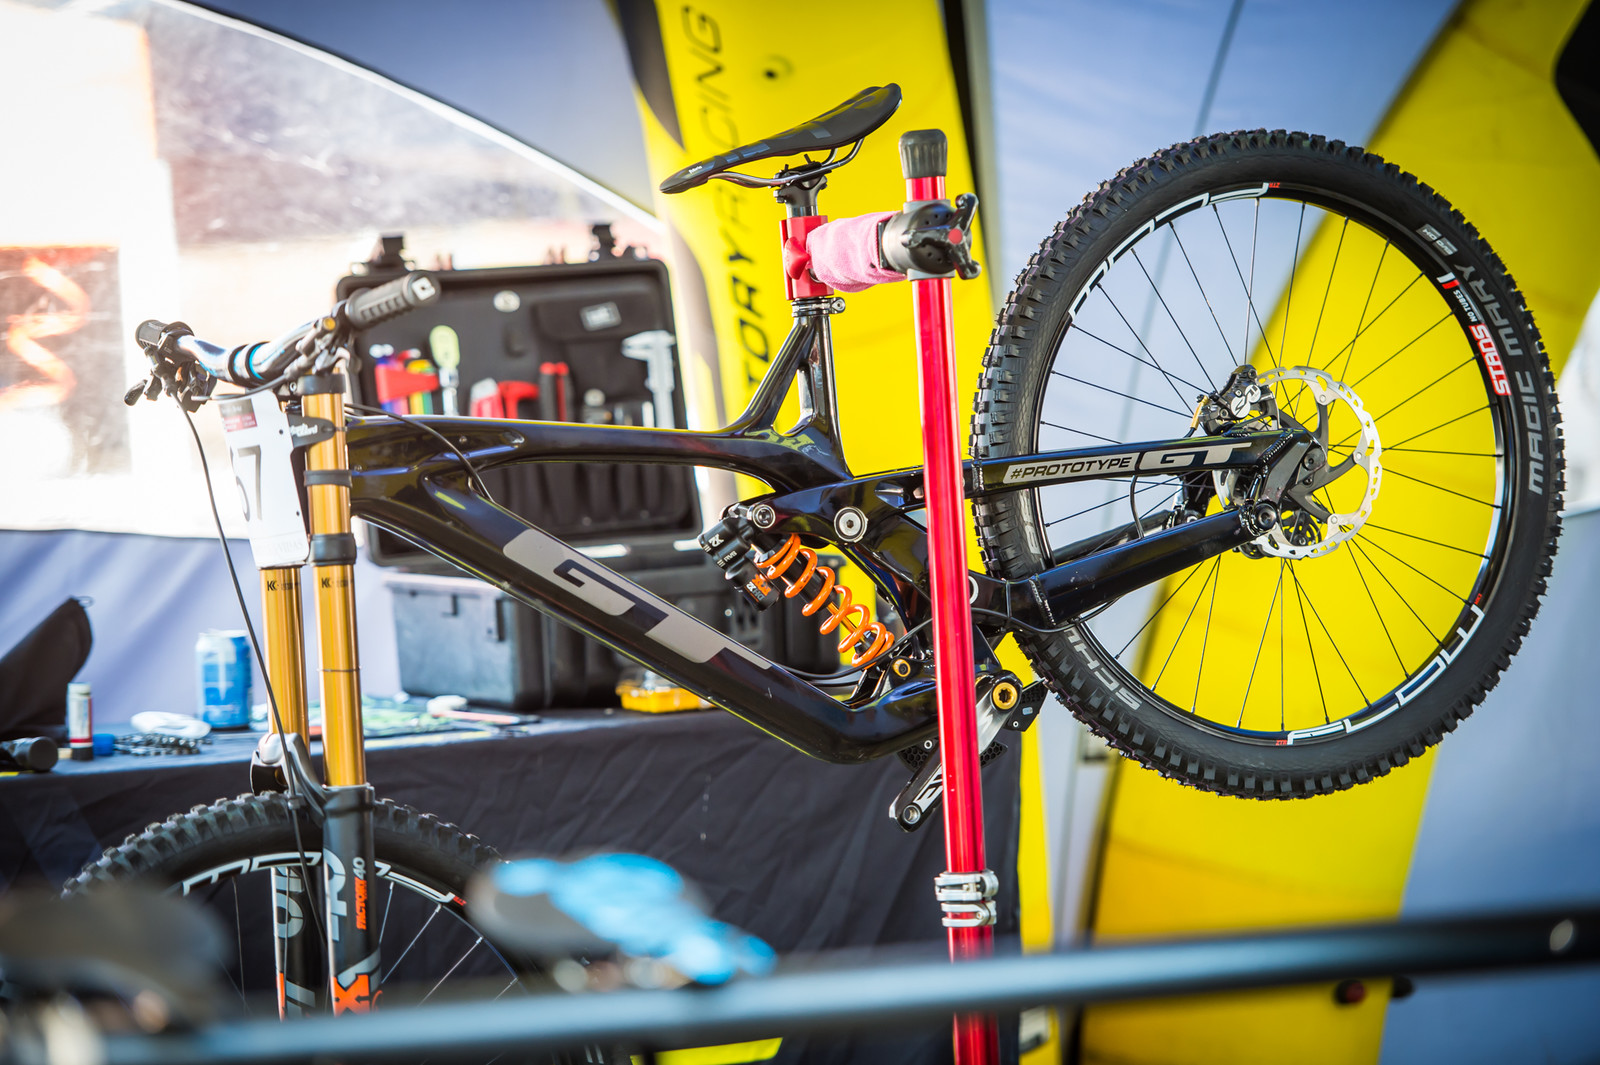 GT Prototype - 2018 Losinj World Cup Pit Bits - Mountain Biking Pictures - Vital MTB